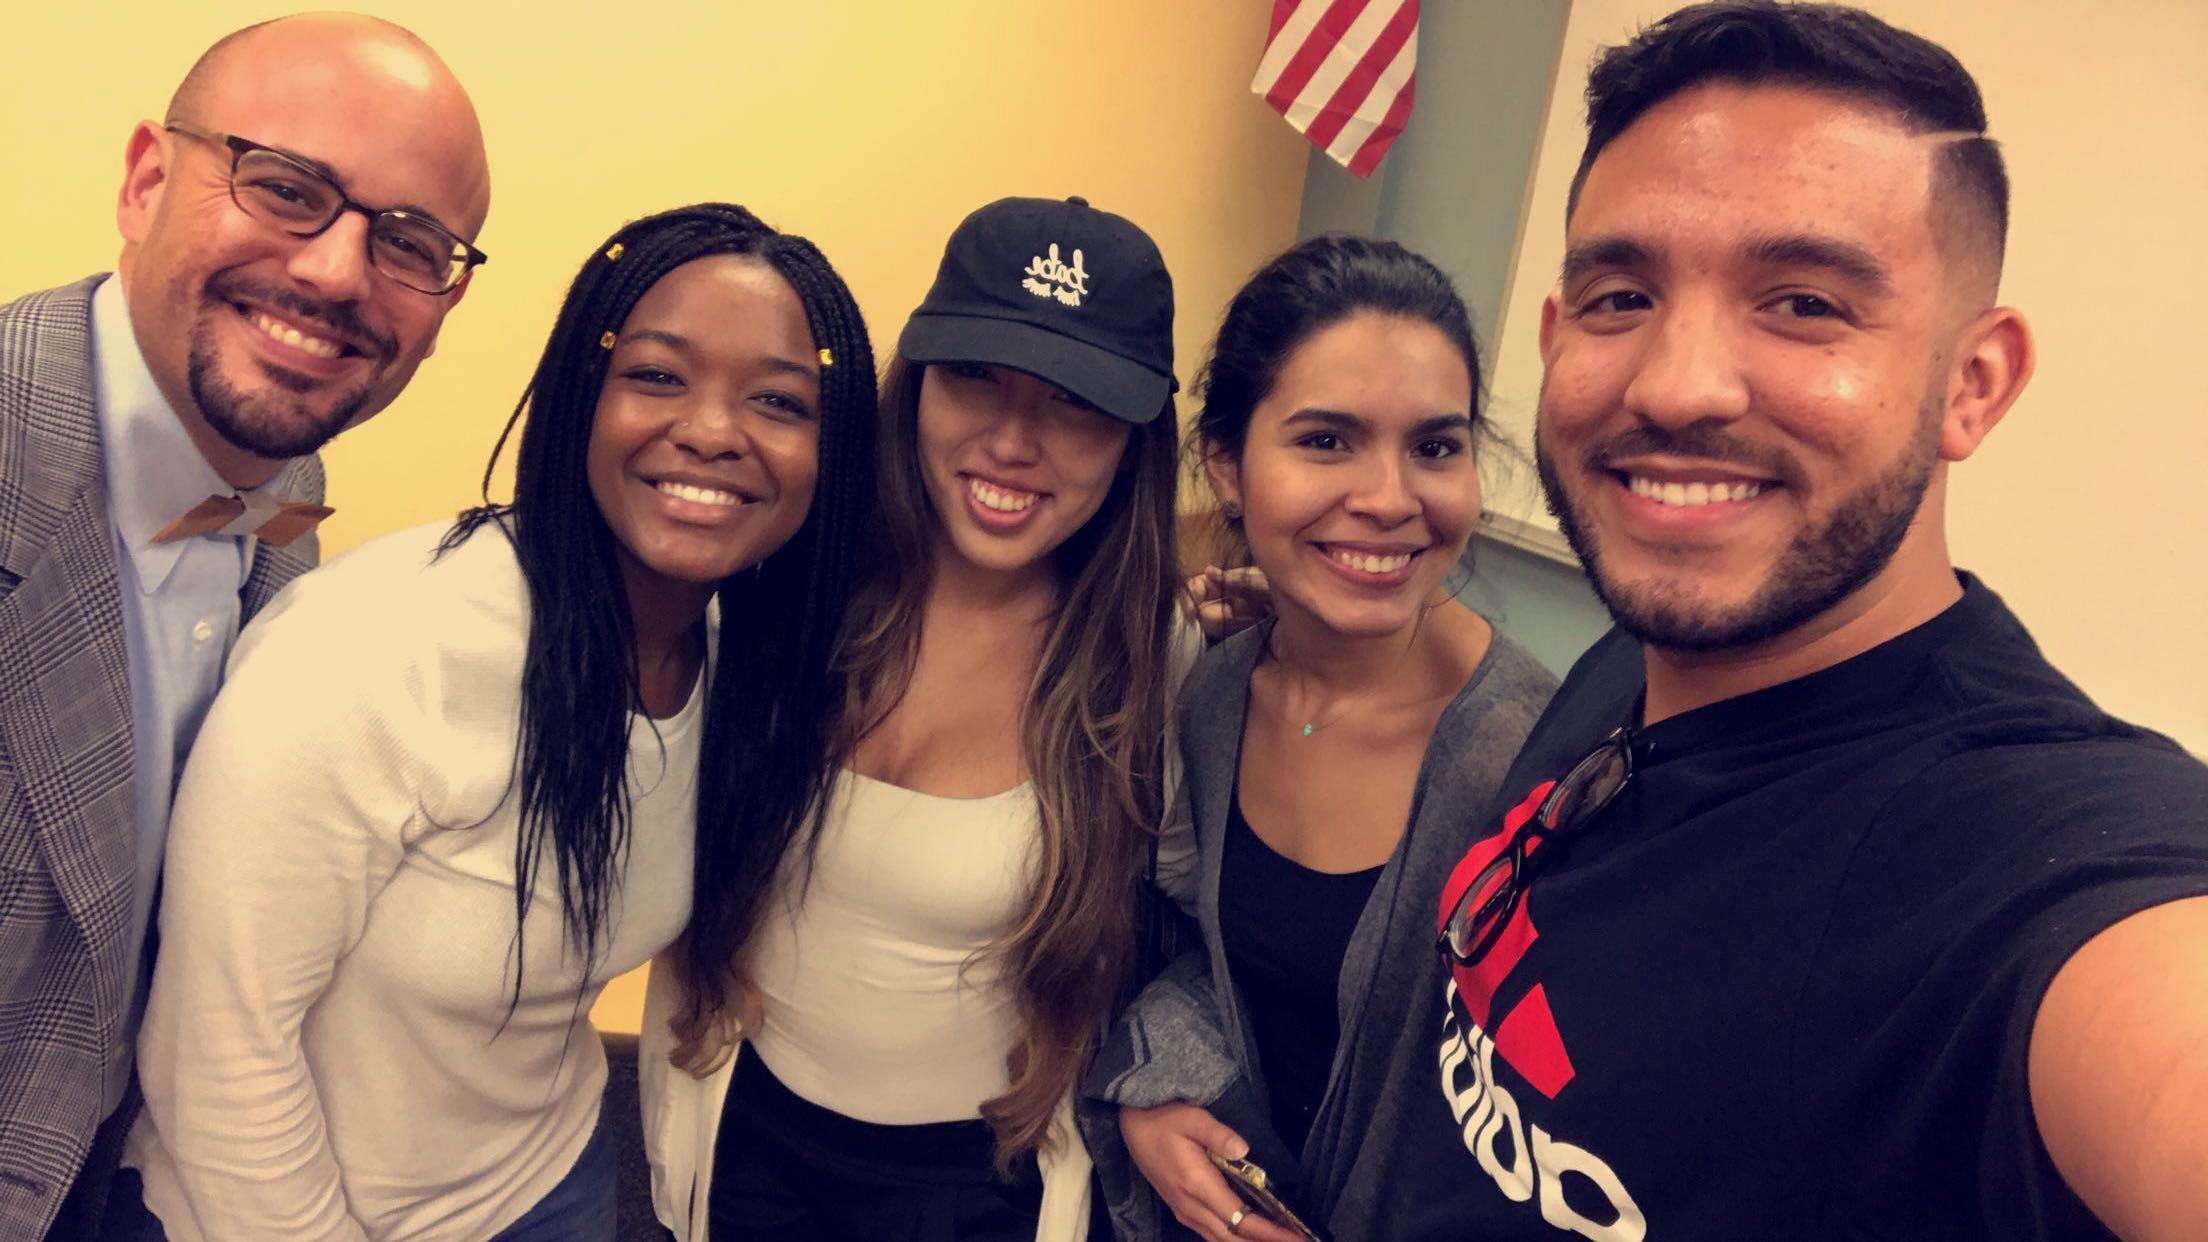 Professor Alfredo Garcia with an African American female university student, two Hispanic university students, and one Hispanic male university student